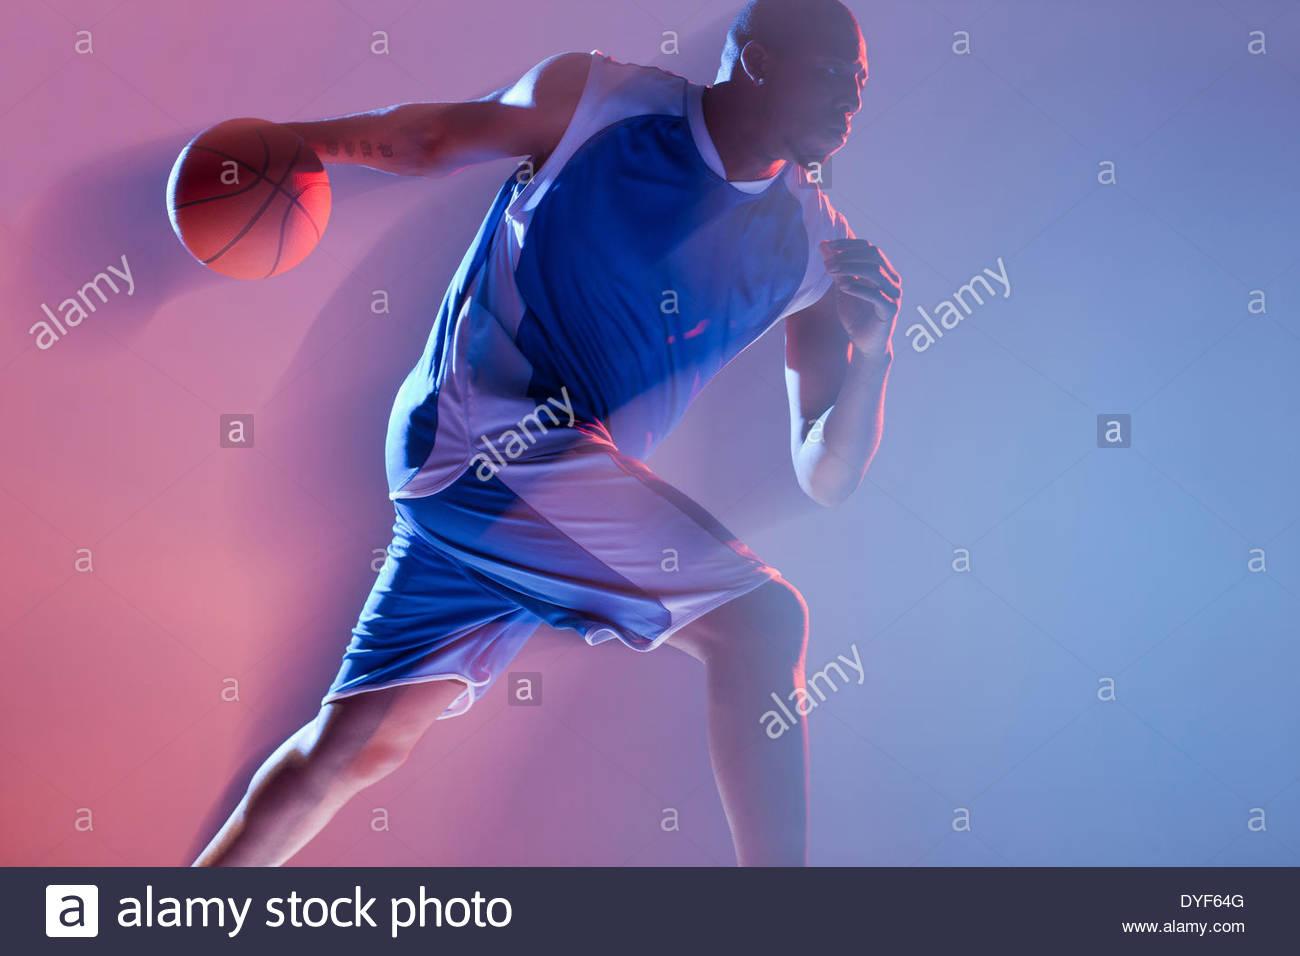 Vista borrosa habilidoso jugador de baloncesto Imagen De Stock